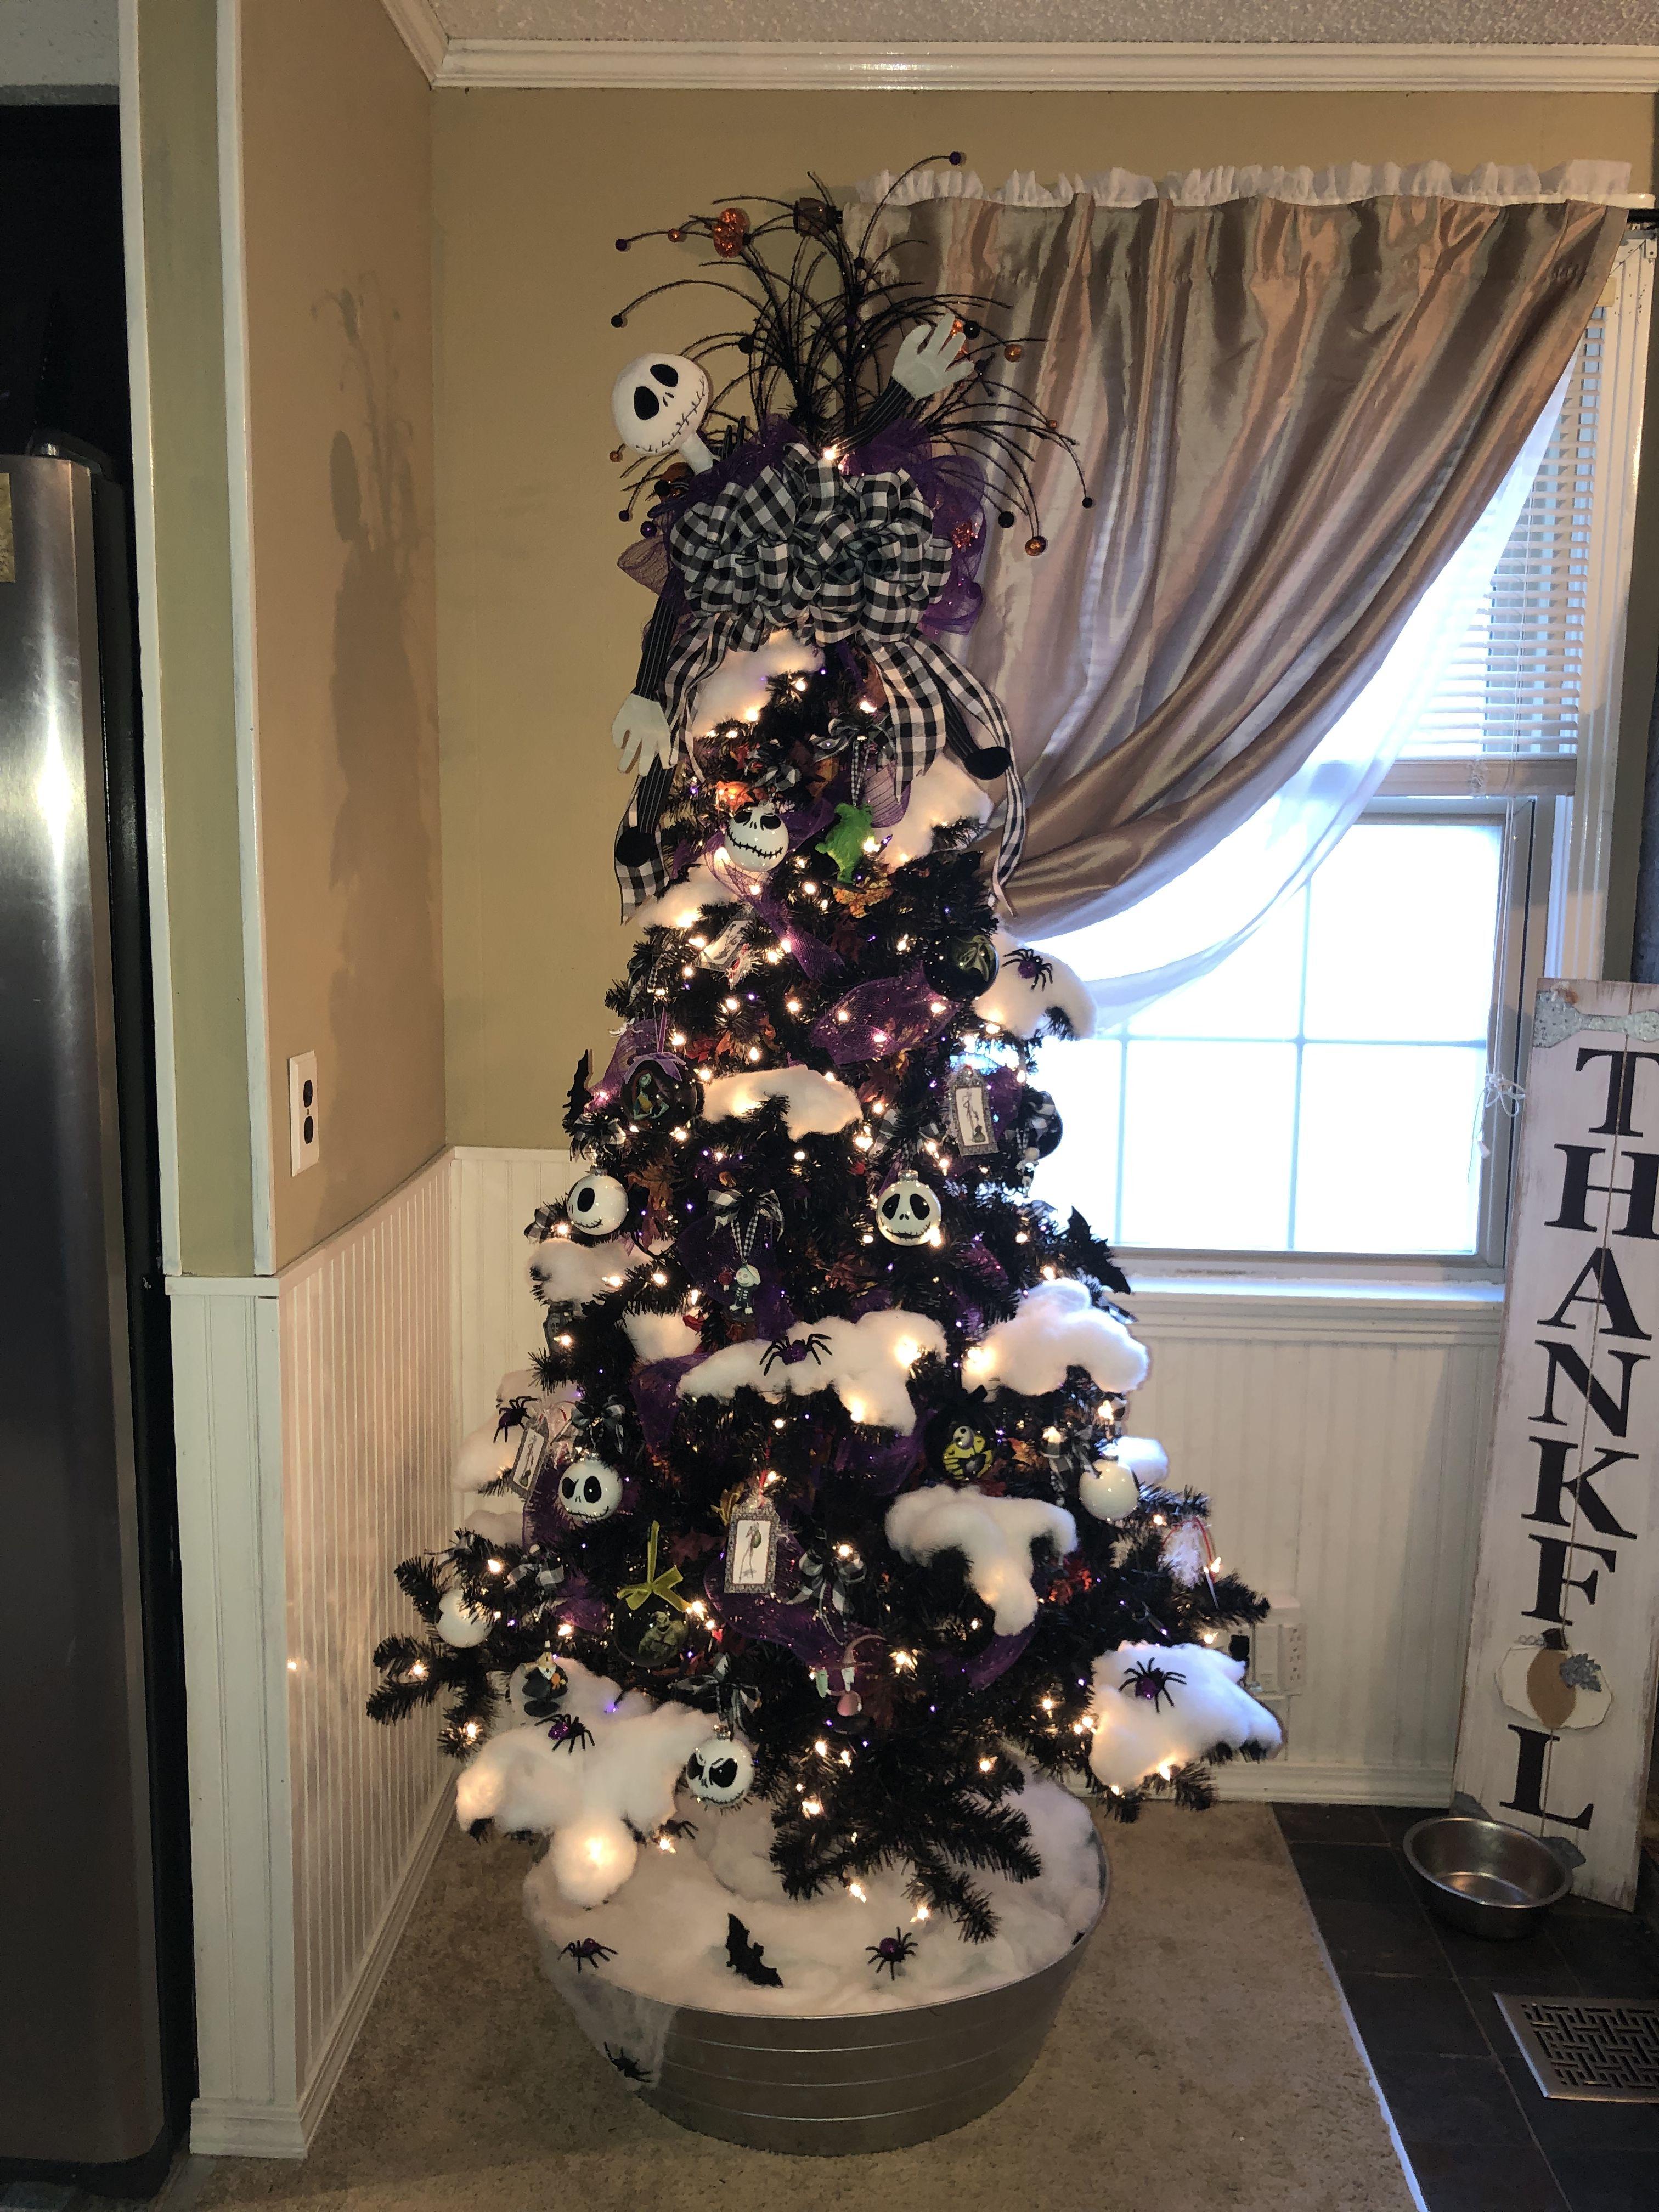 Nightmare Before Christmas Tree Nightmare Before Christmas Ornaments Nightmare Before Christmas Decorations Nightmare Before Christmas Tree